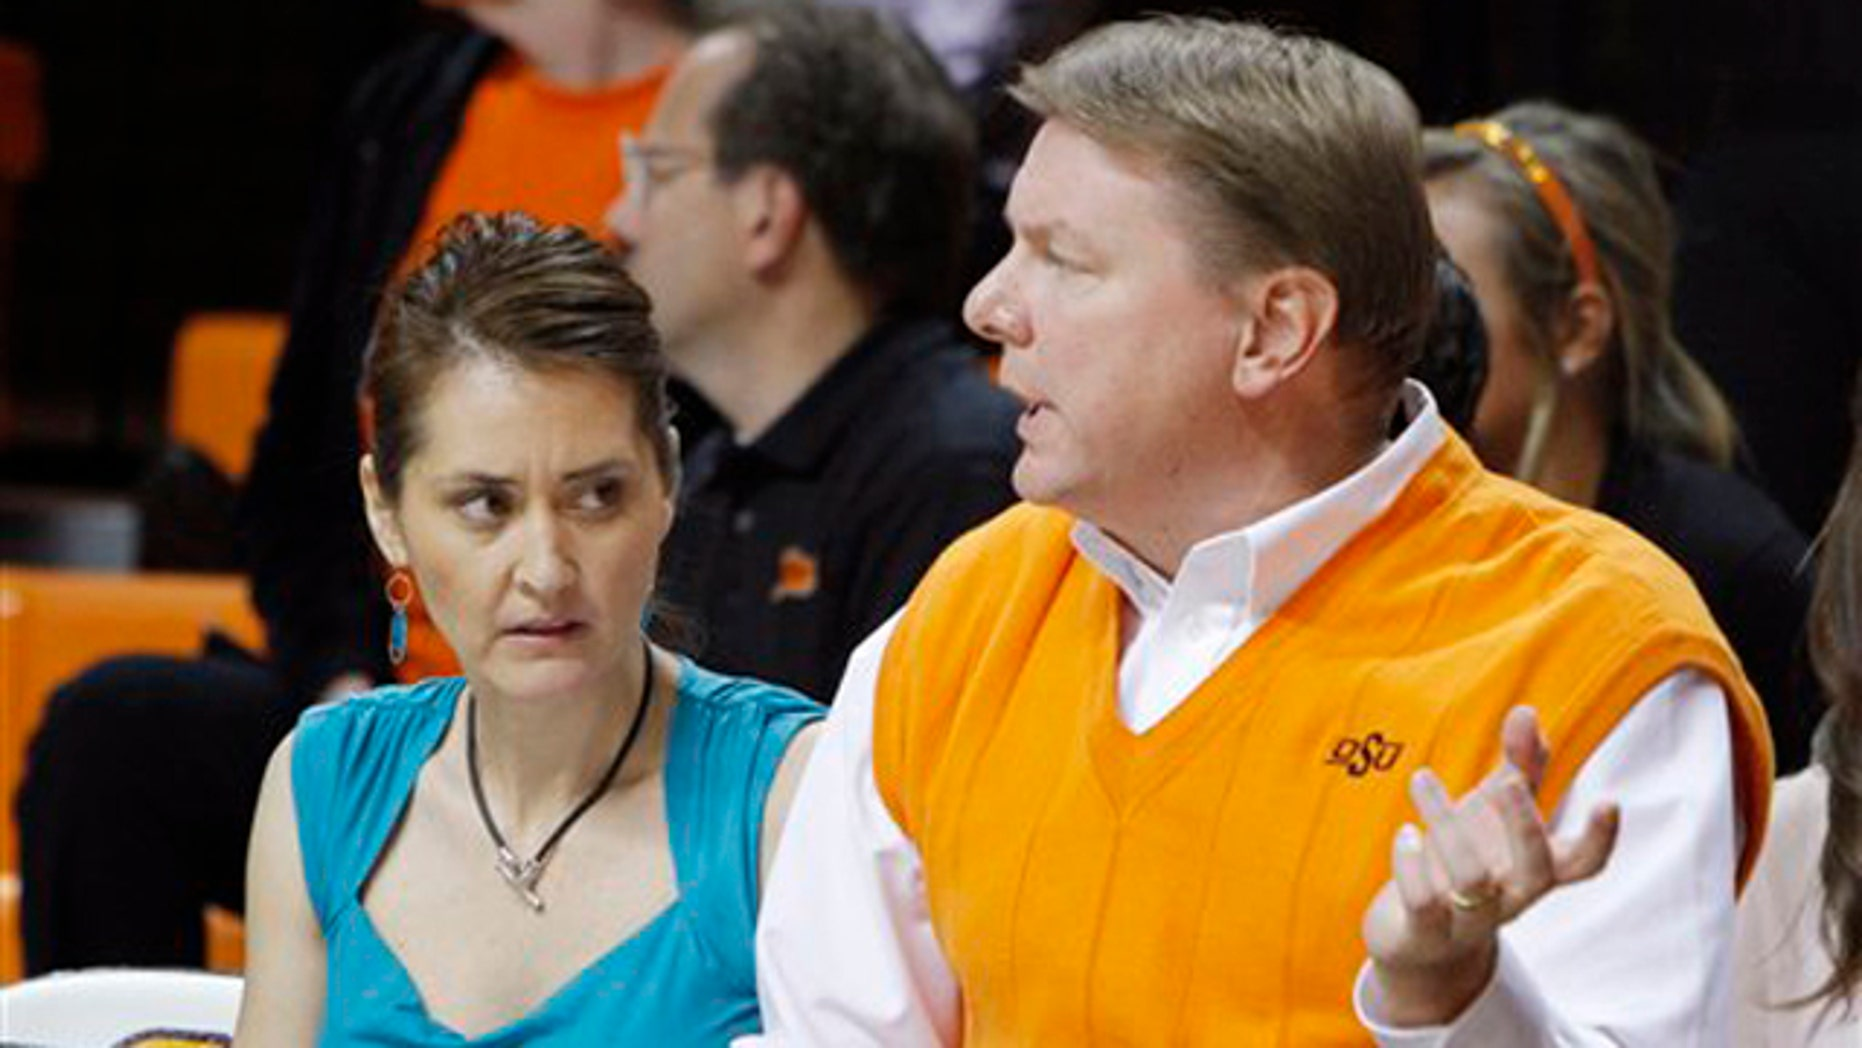 November 9, 2011: Oklahoma State women's basketball coach Kurt Budke and assistant coach Miranda Serna talk during an an exhibition women's NCAA college basketball game against Fort Hays State, in Stillwater, Okla.